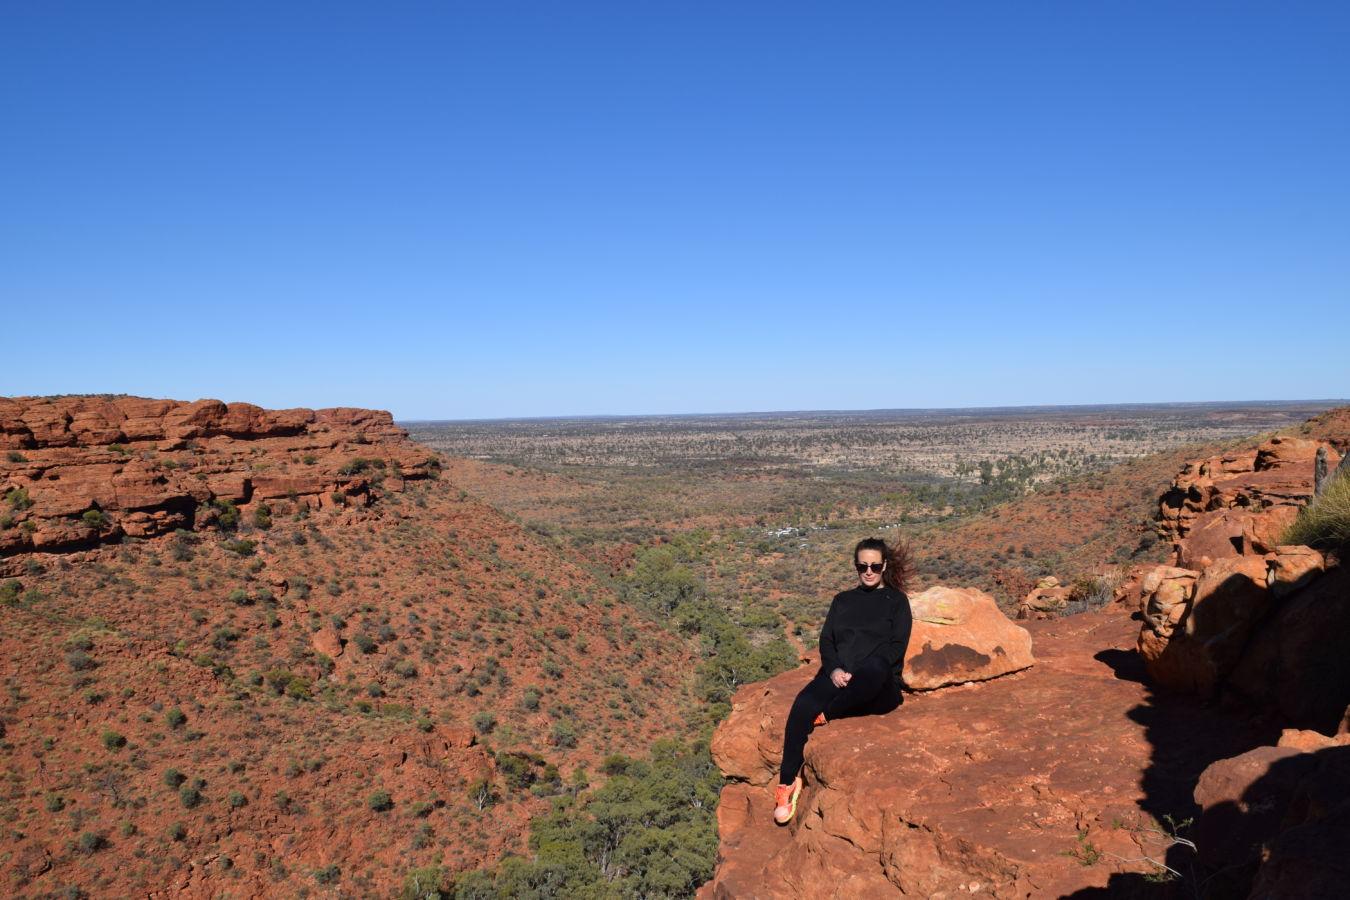 Kings Canyon Australi-ana